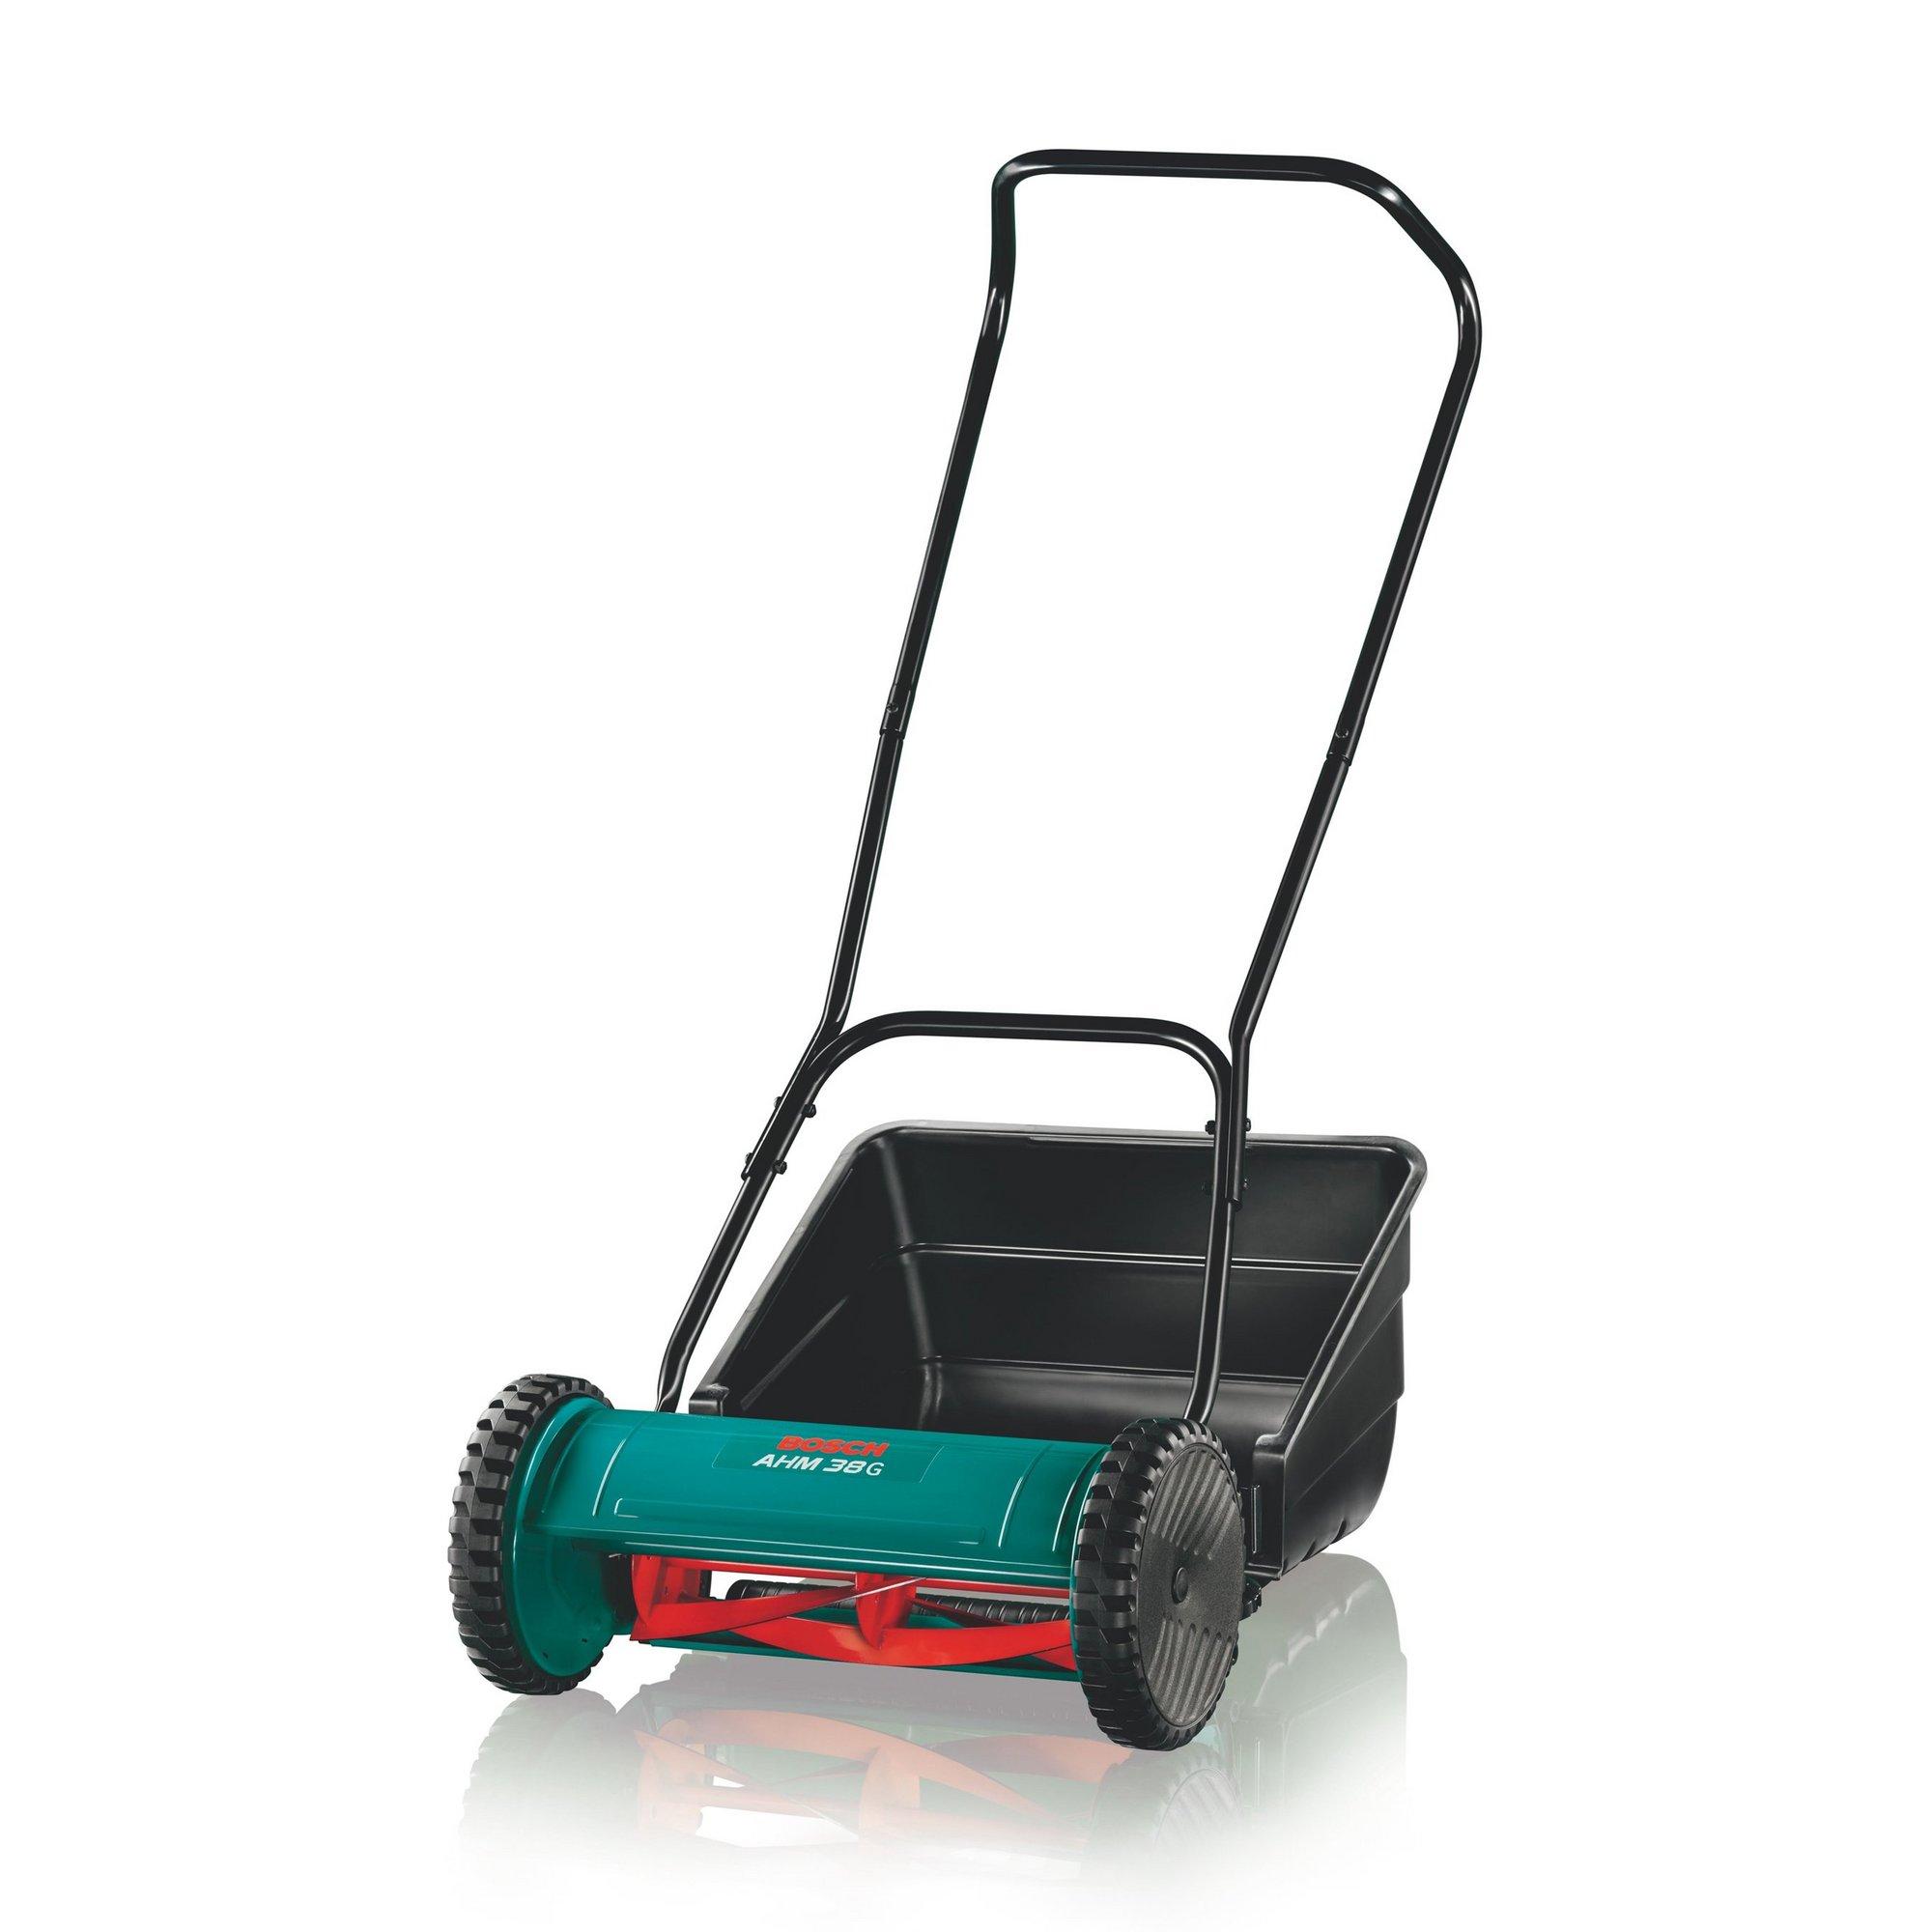 Image of Bosch AHM38G Hand Push Cylinder Lawnmower